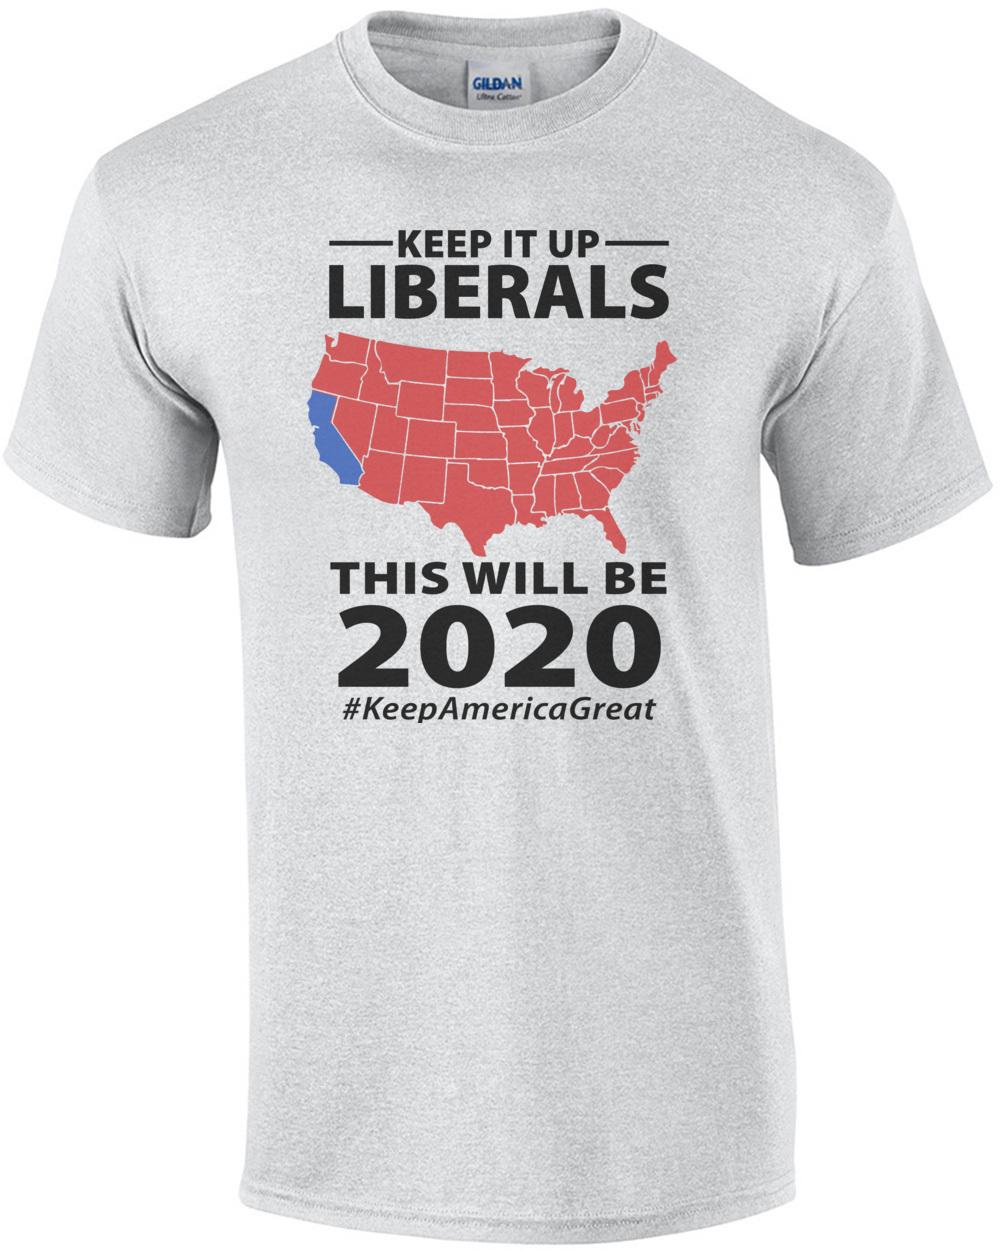 21537b93 keep-it-up-liberals --this-will-be-2020-keepamericagreat--pro-trump--conservative-tshirt -mens-regular-ash.jpg